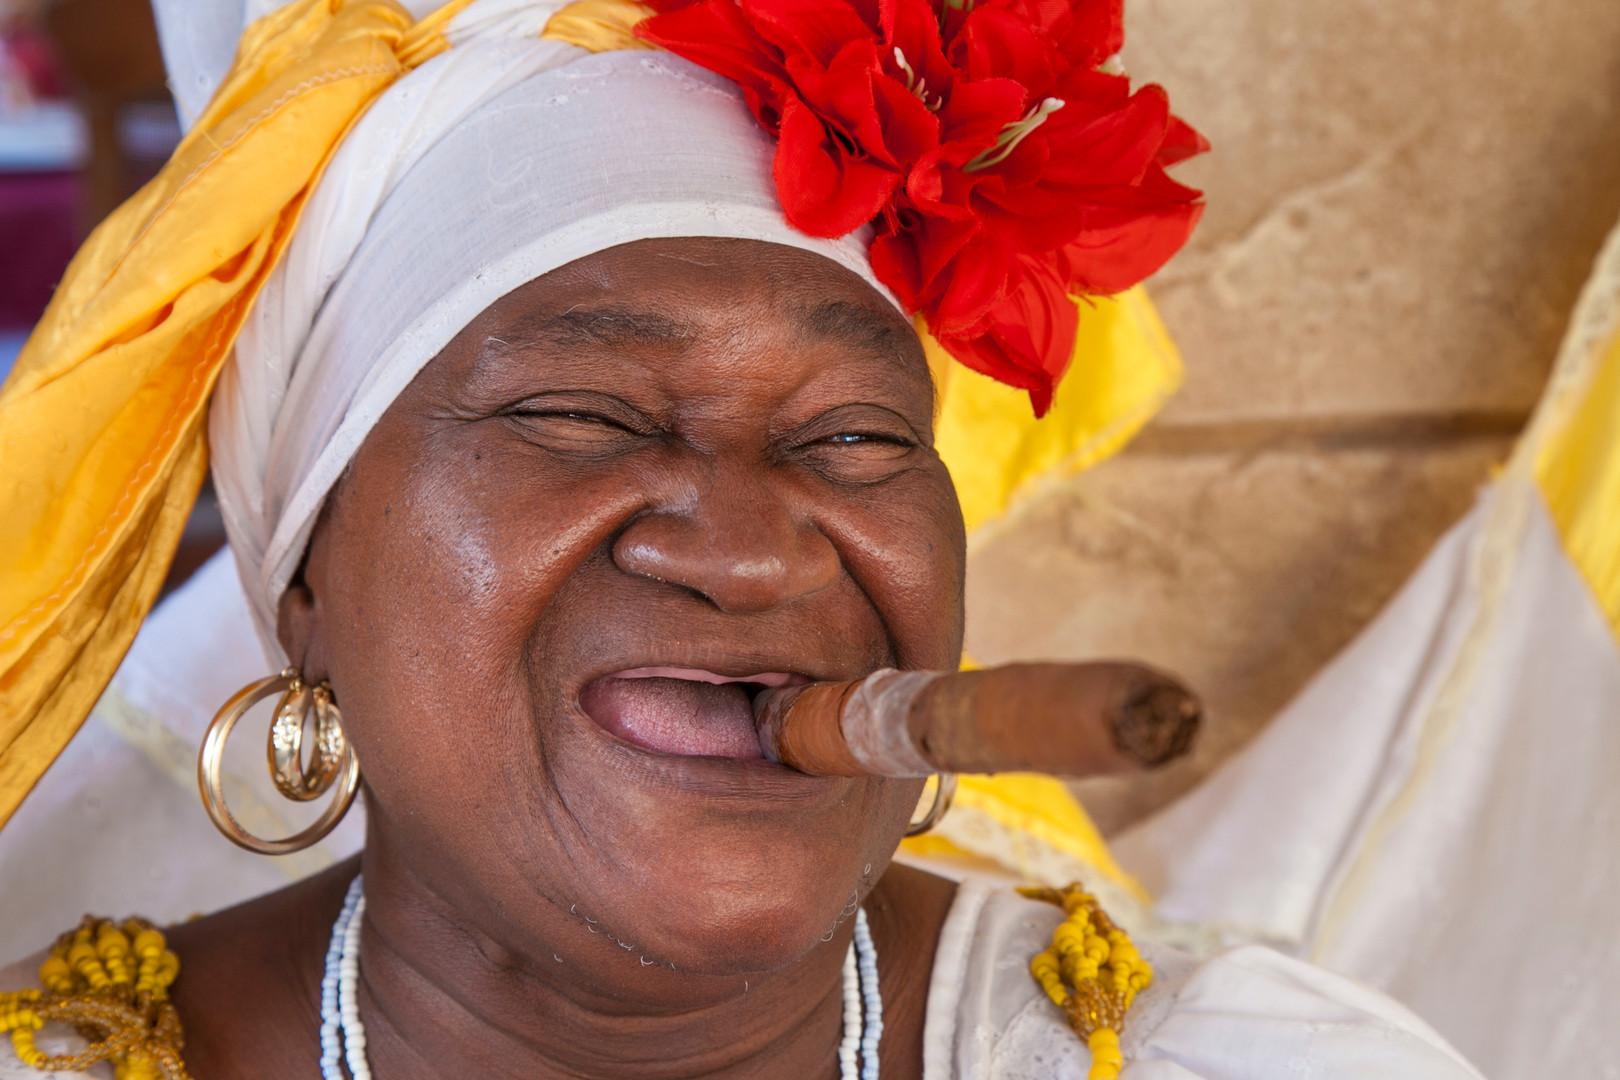 femme cigar.jpg